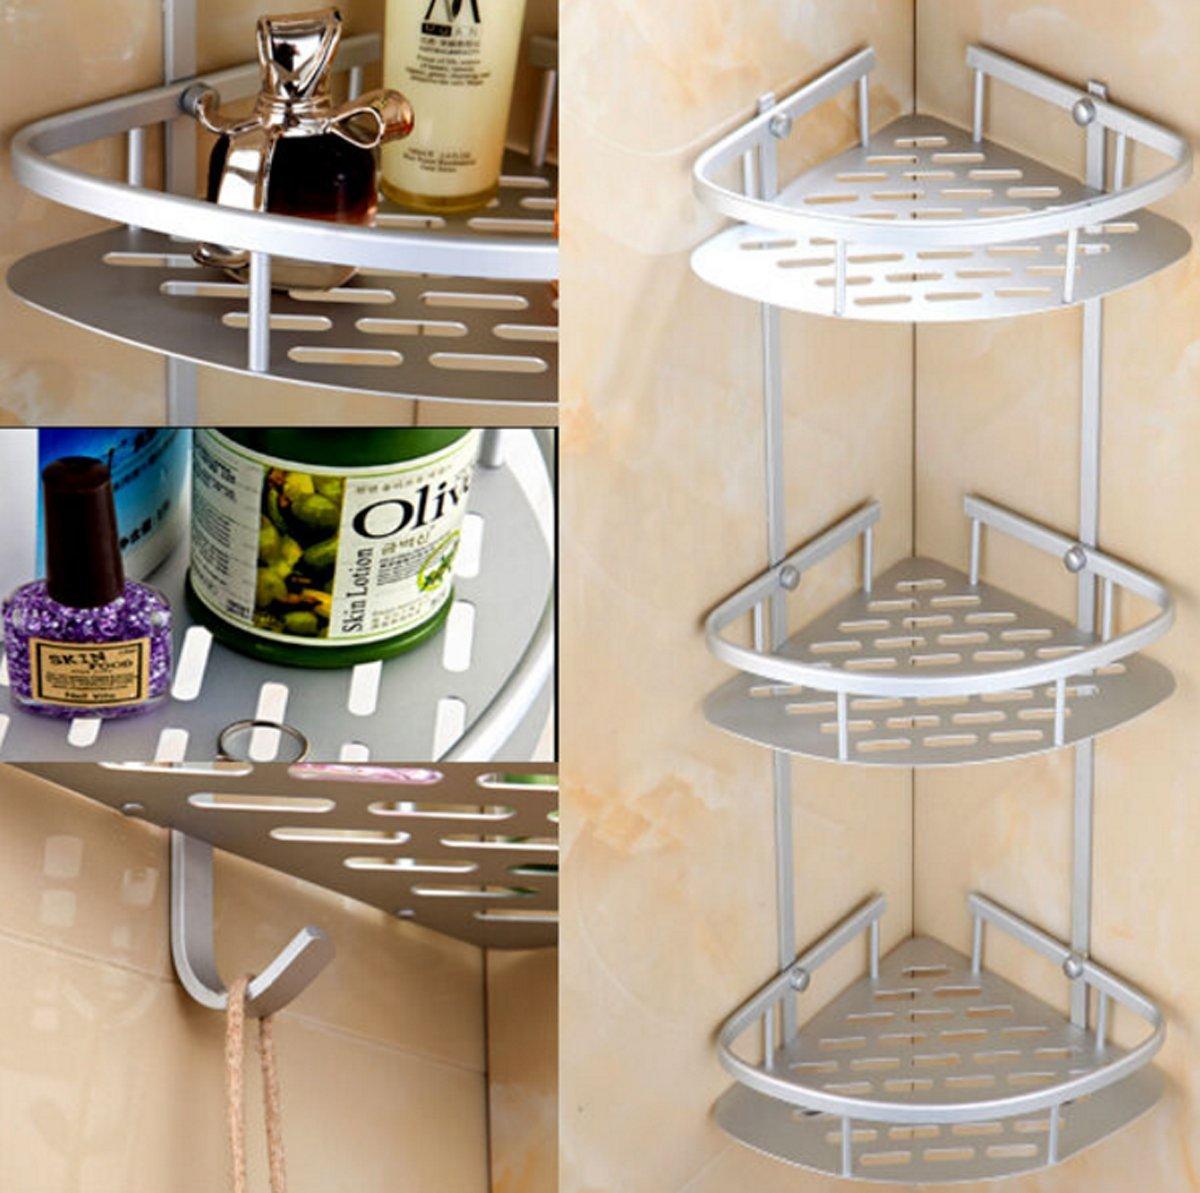 3 Tier Aluminum Bathroom Corner Shelves, Large Capacity Shower Shelf Rack Organiser with Hooks Yosoo